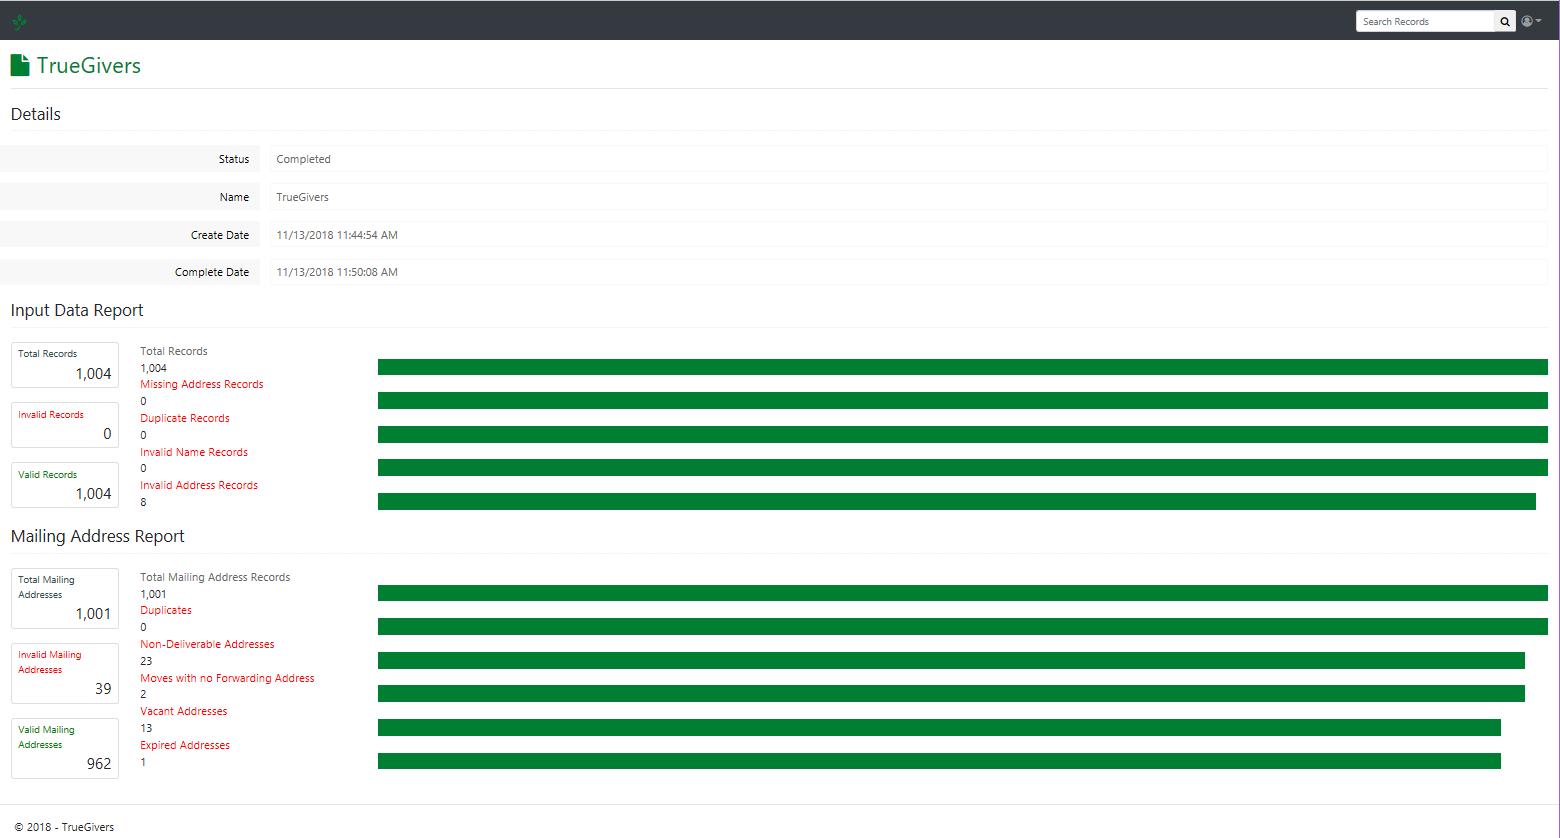 TrueGivers update display page